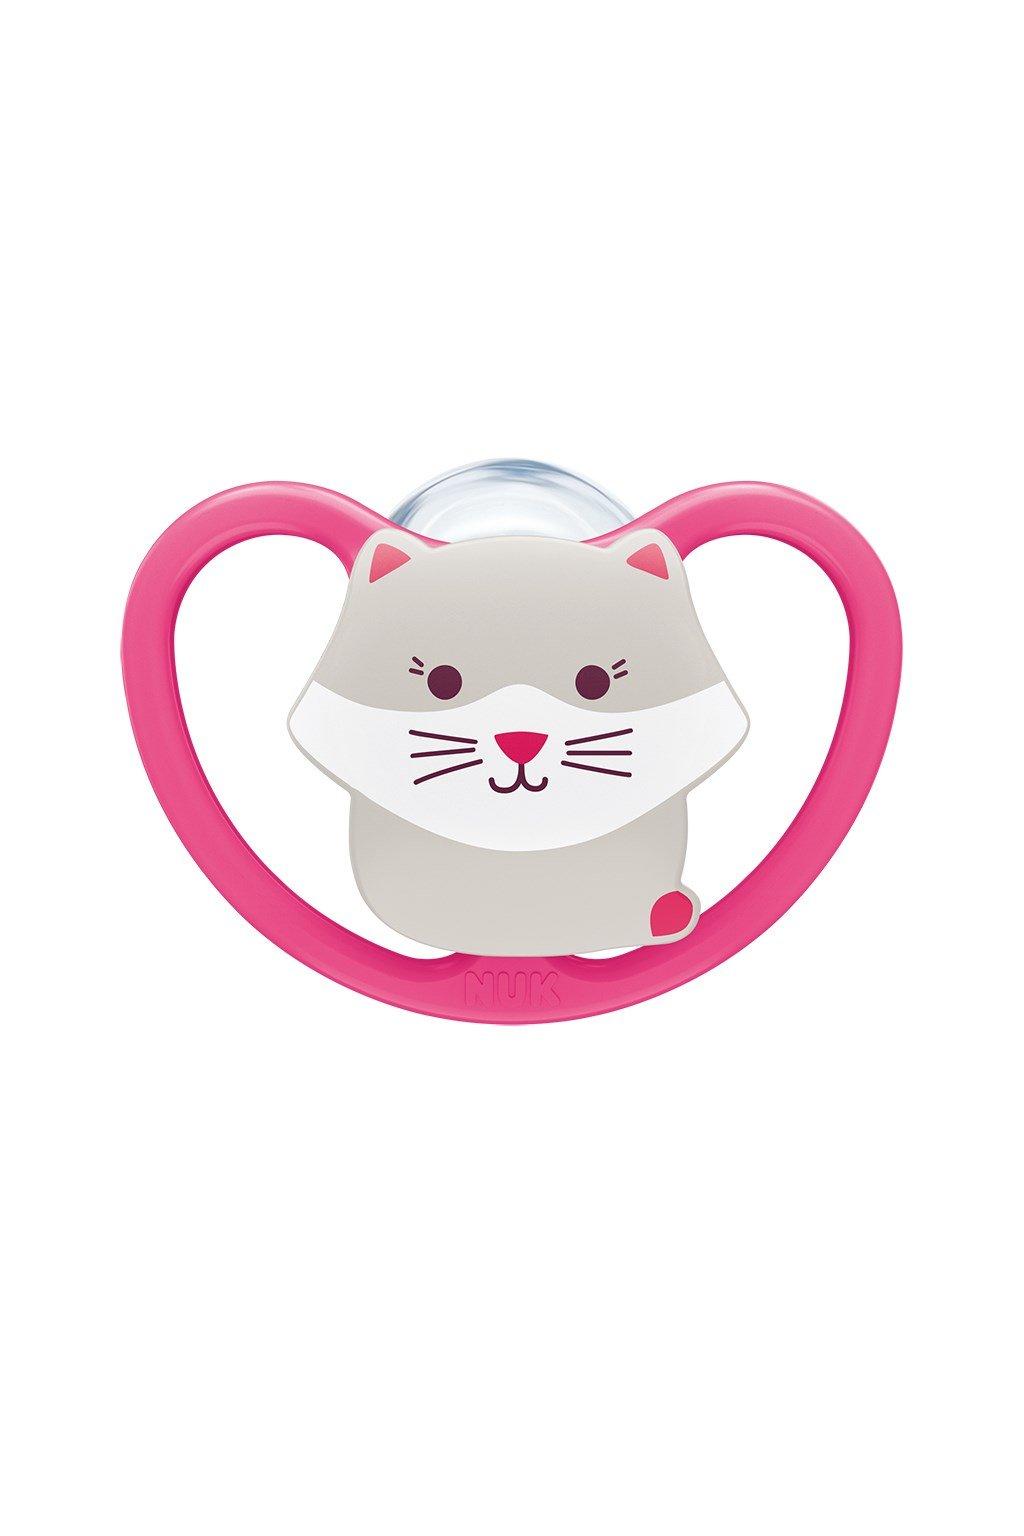 Cumlík Space NUK 6-18m mačička BOX dievča